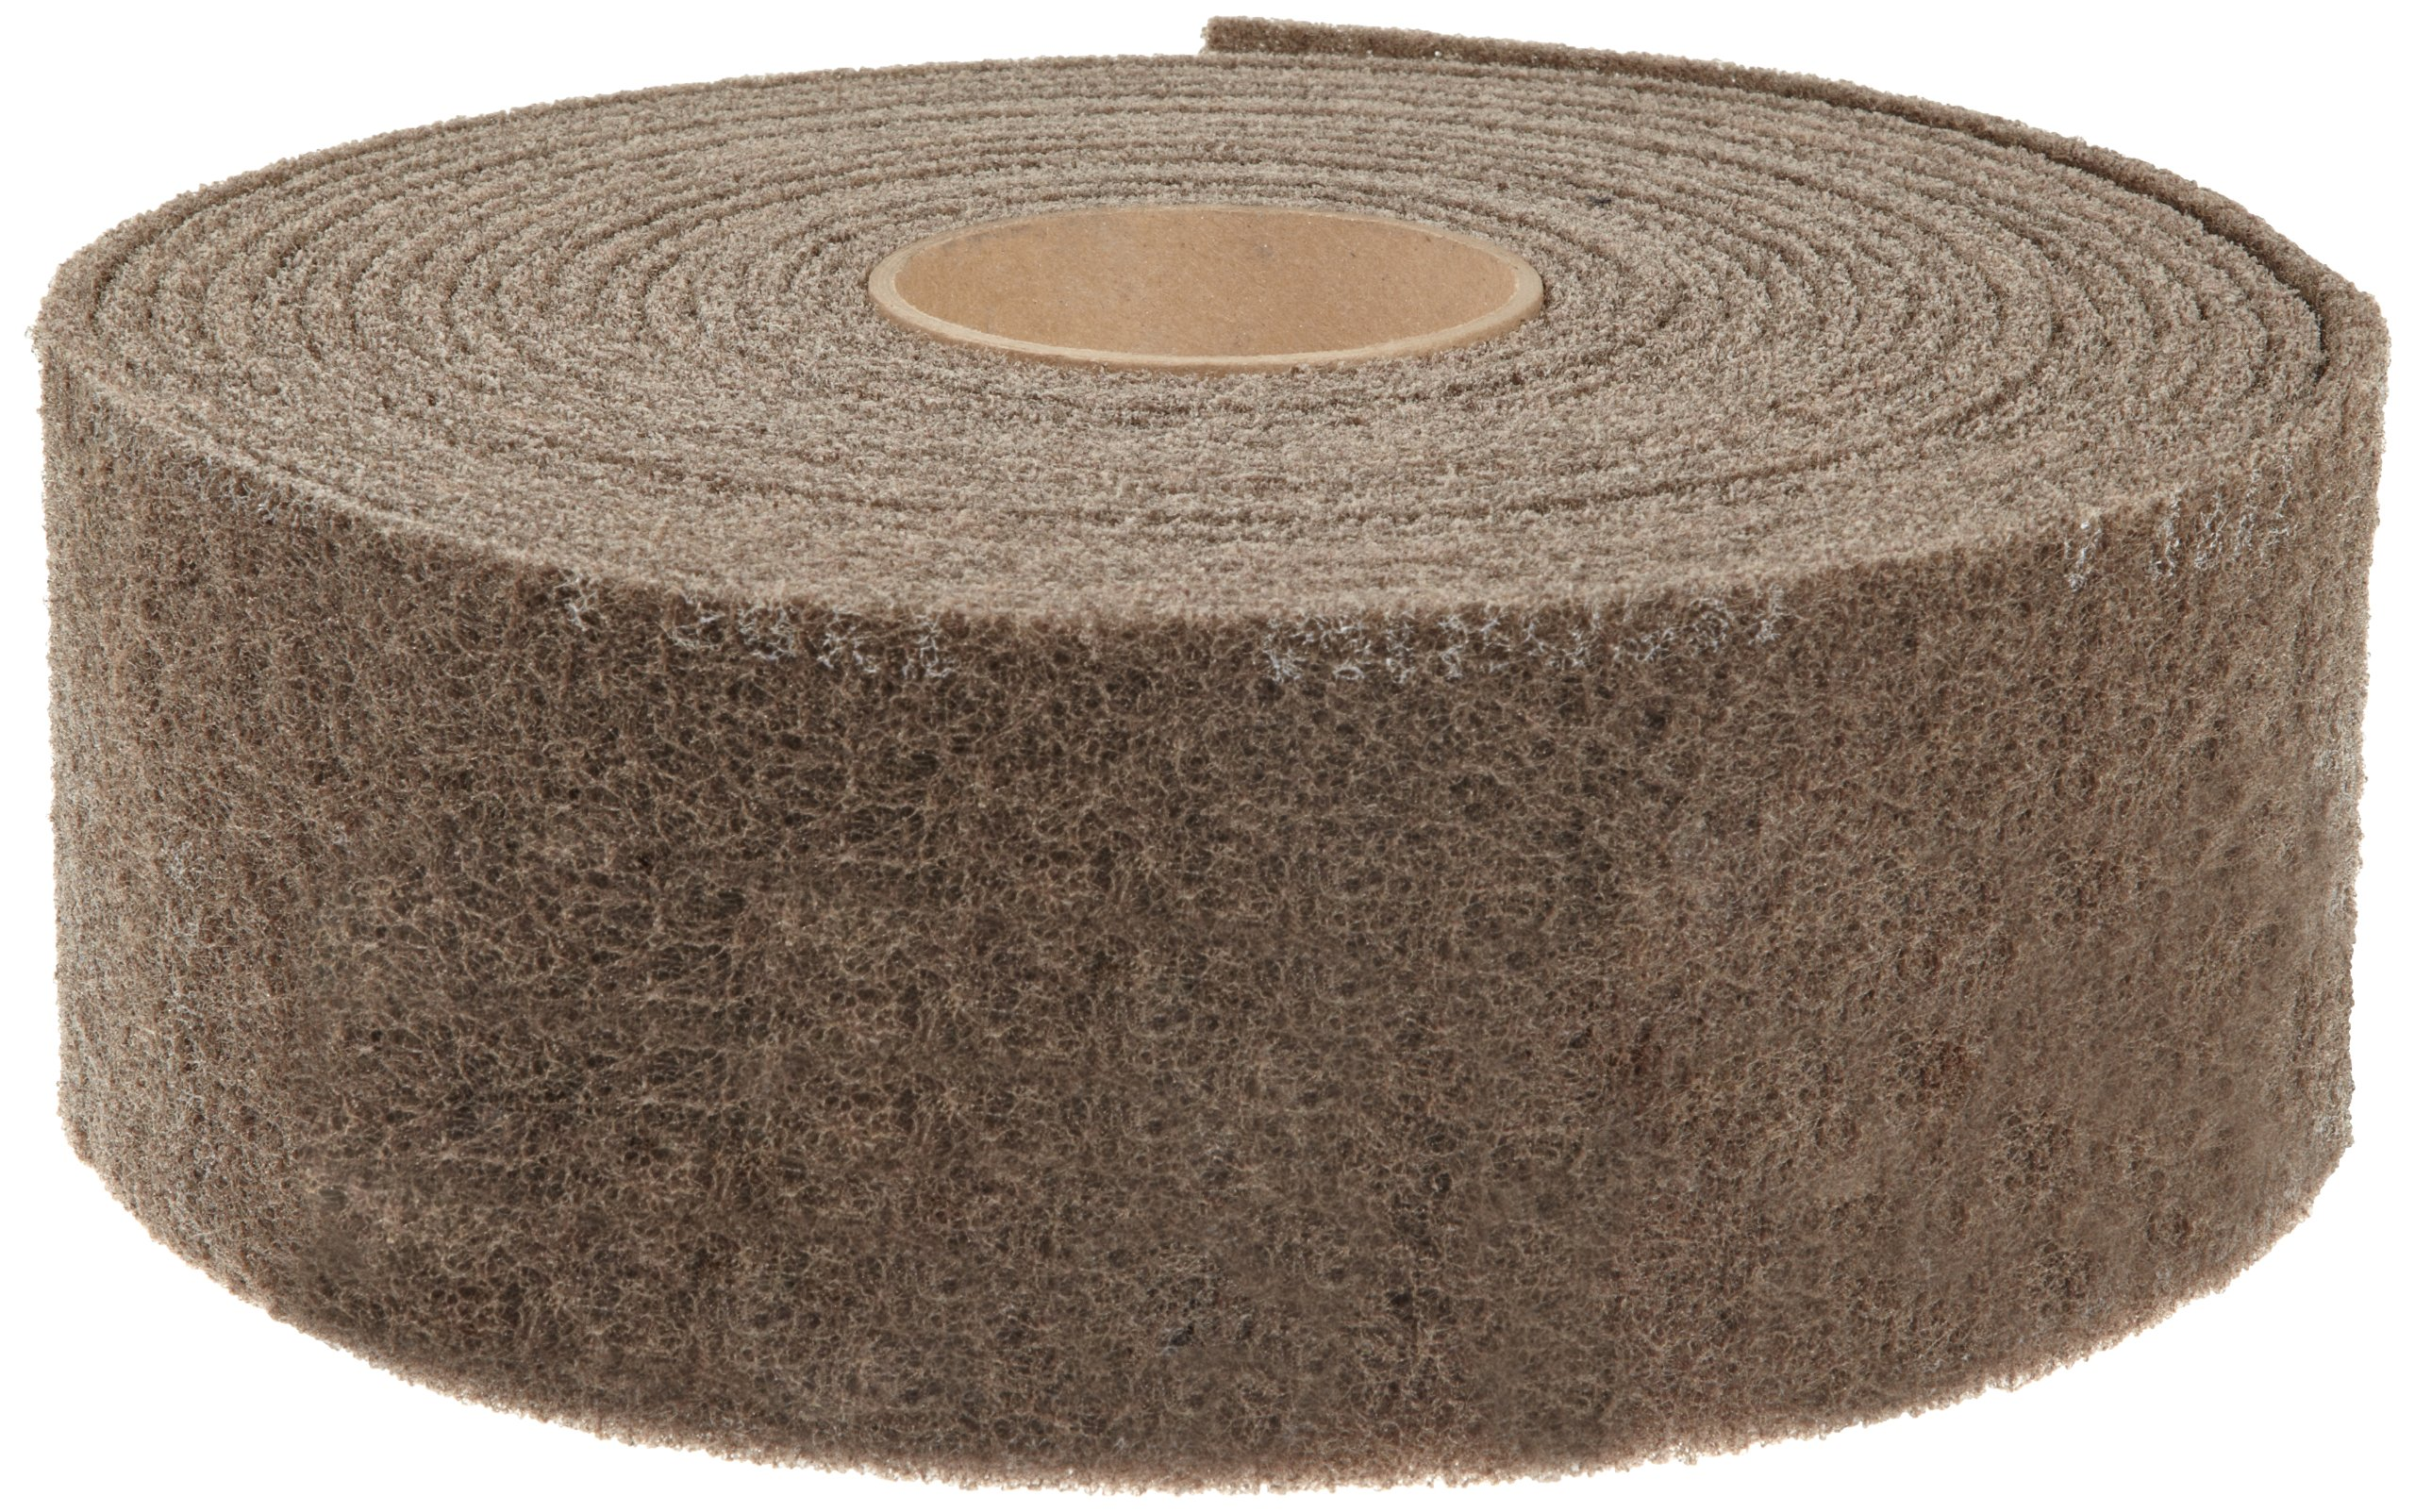 Scotch-Brite Cut and Polish Roll, Aluminum Oxide, 4'' Width x 30' Length, A Medium Grit (Pack of 1)